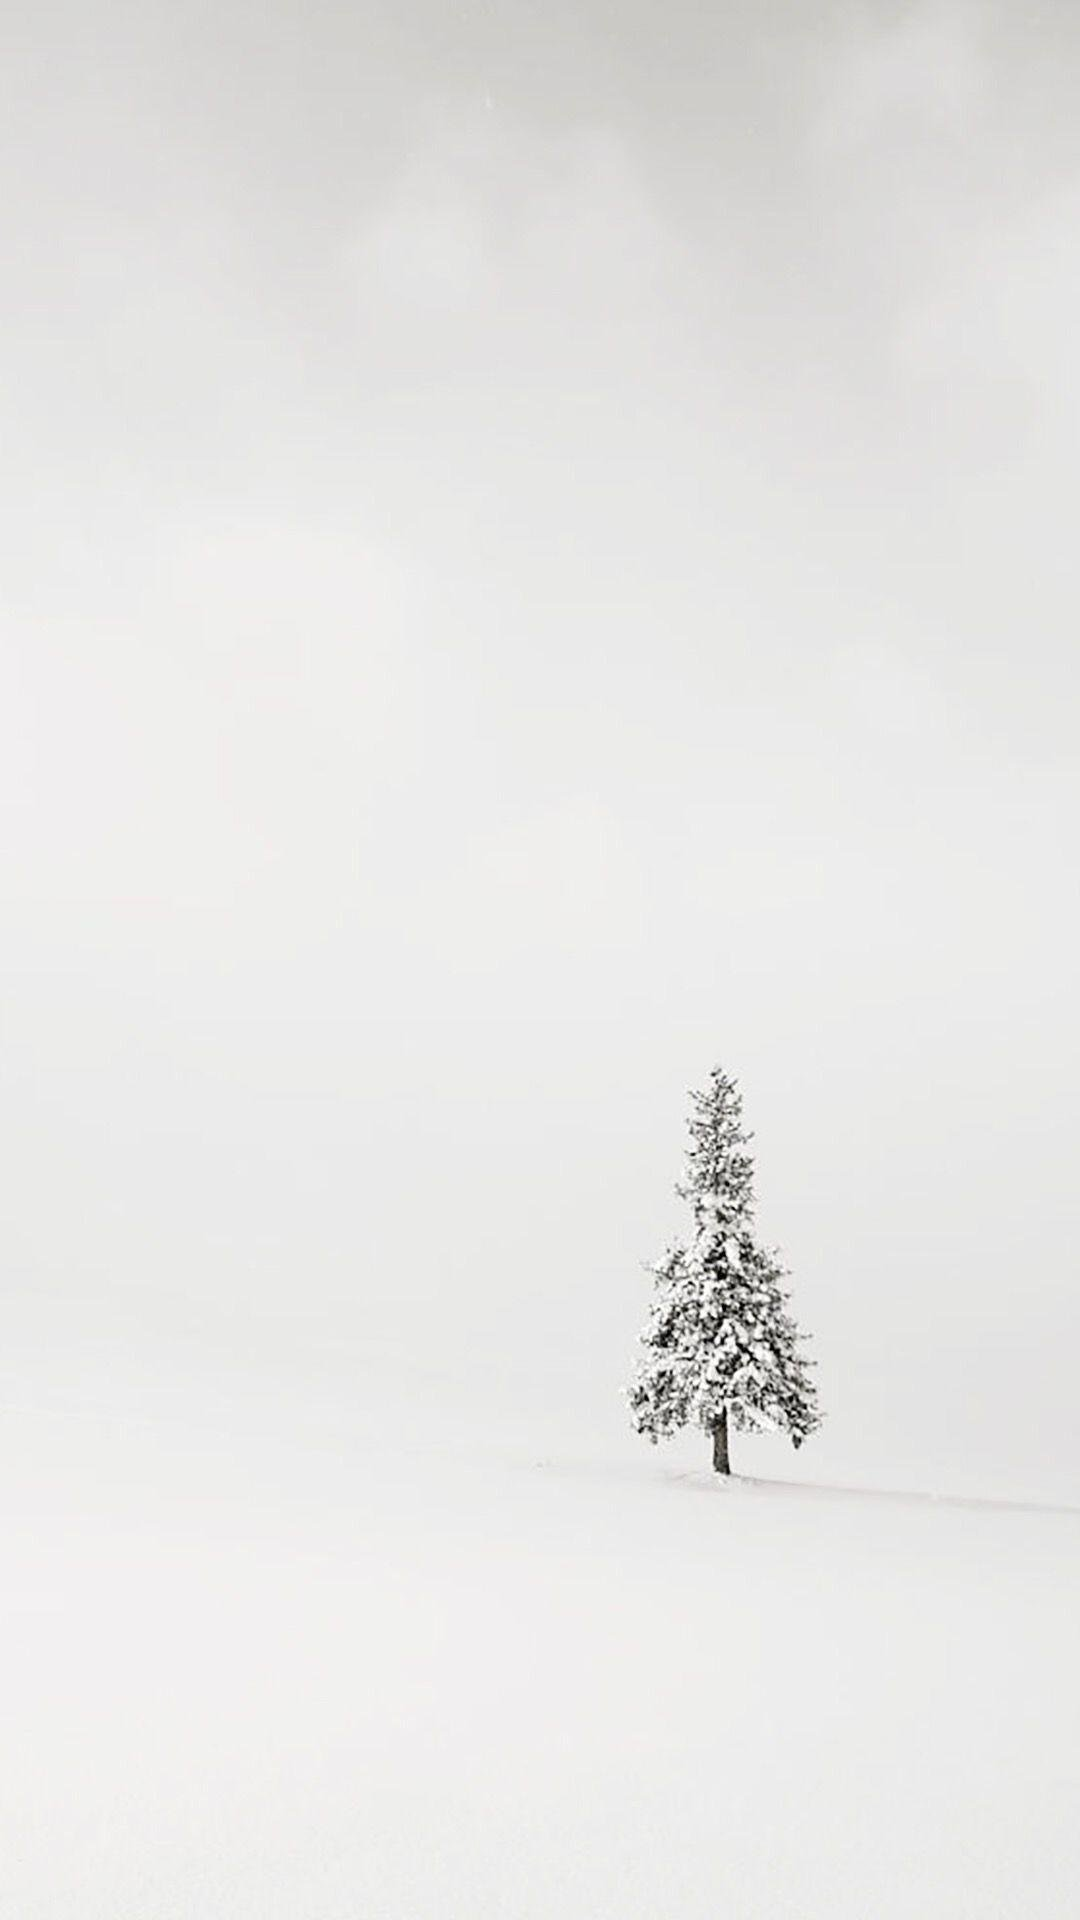 so nice Simple Christmas Wallpaper